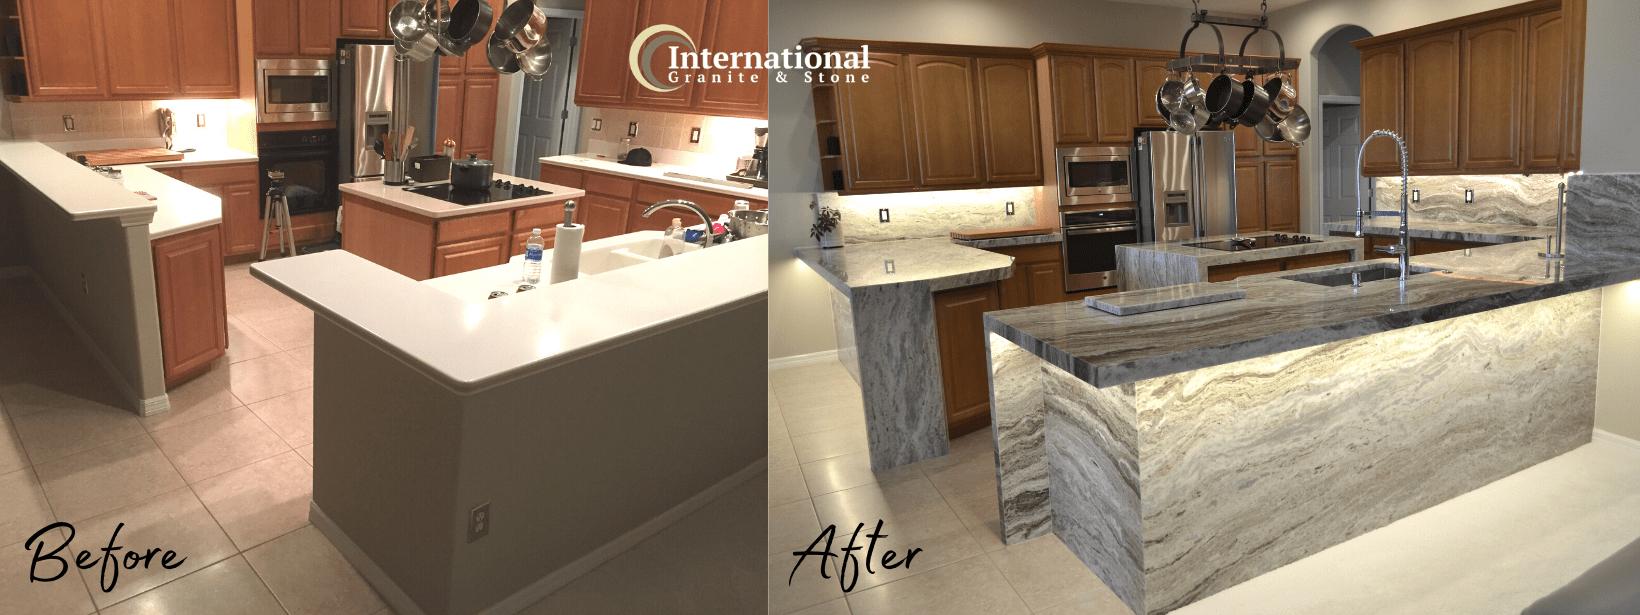 Before and After Brown Fantasy Granite Quartzite Kitchen Countertops Full Height Backsplash